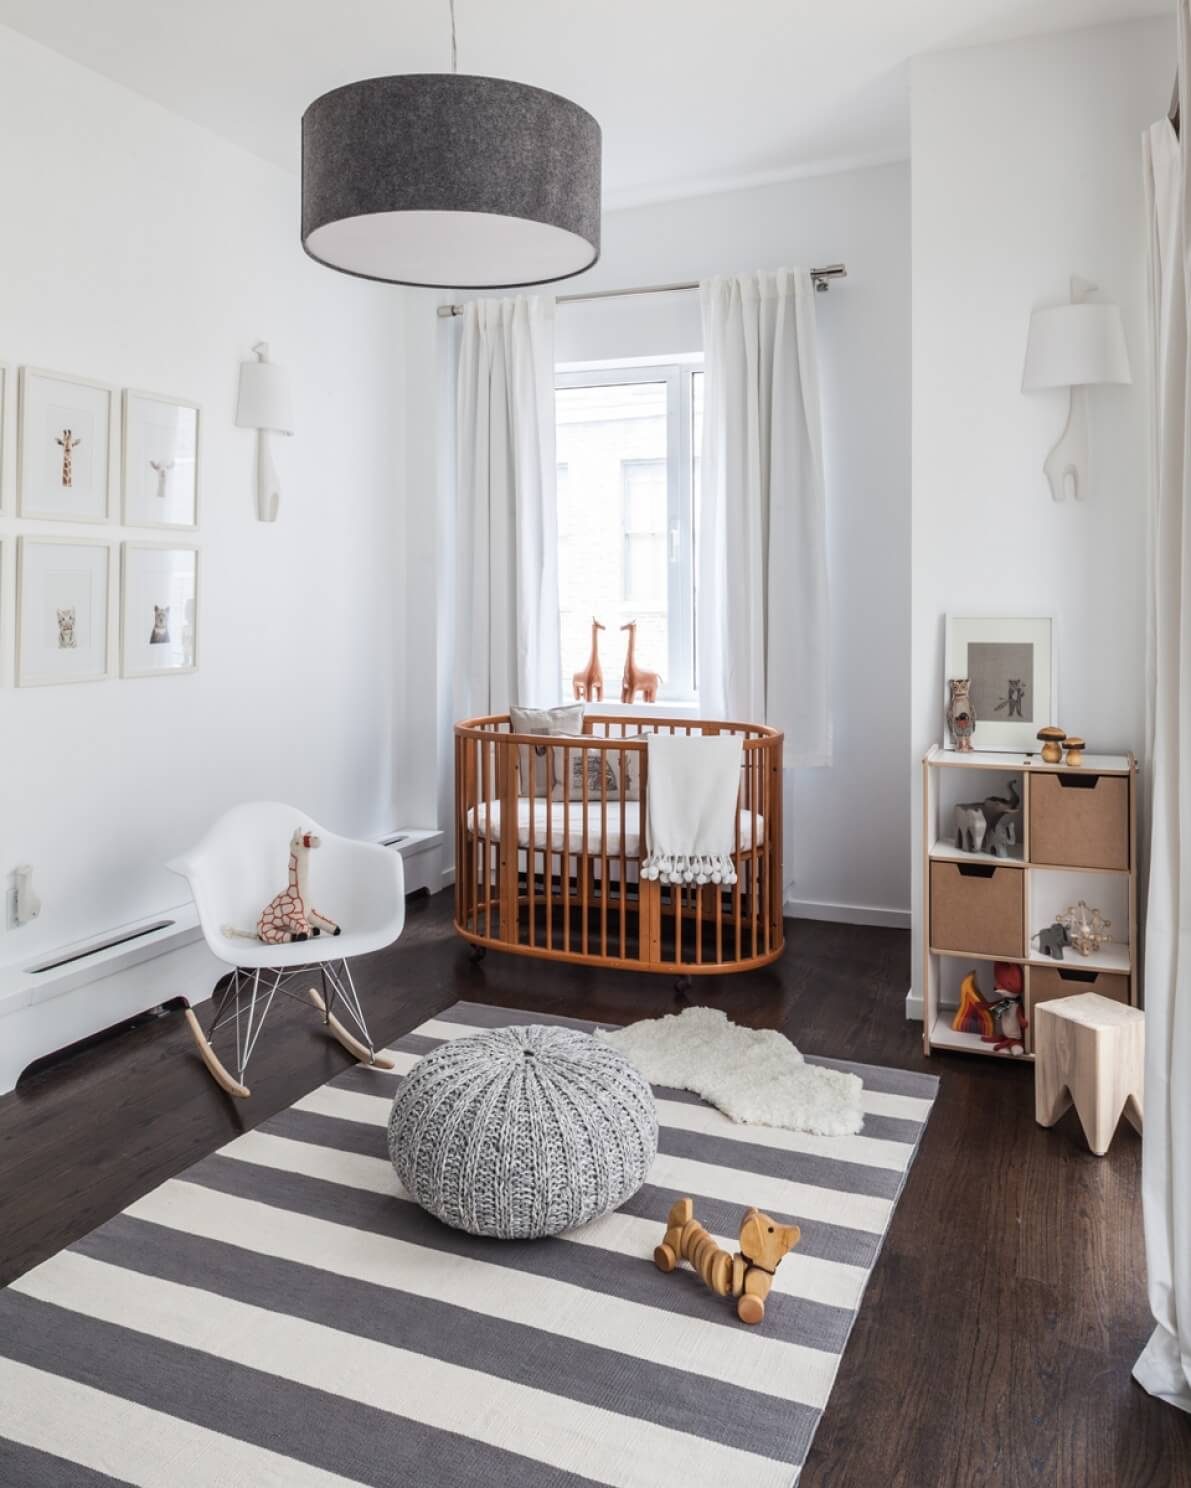 35+ Best Nursery Decor Ideas and Designs for 2018